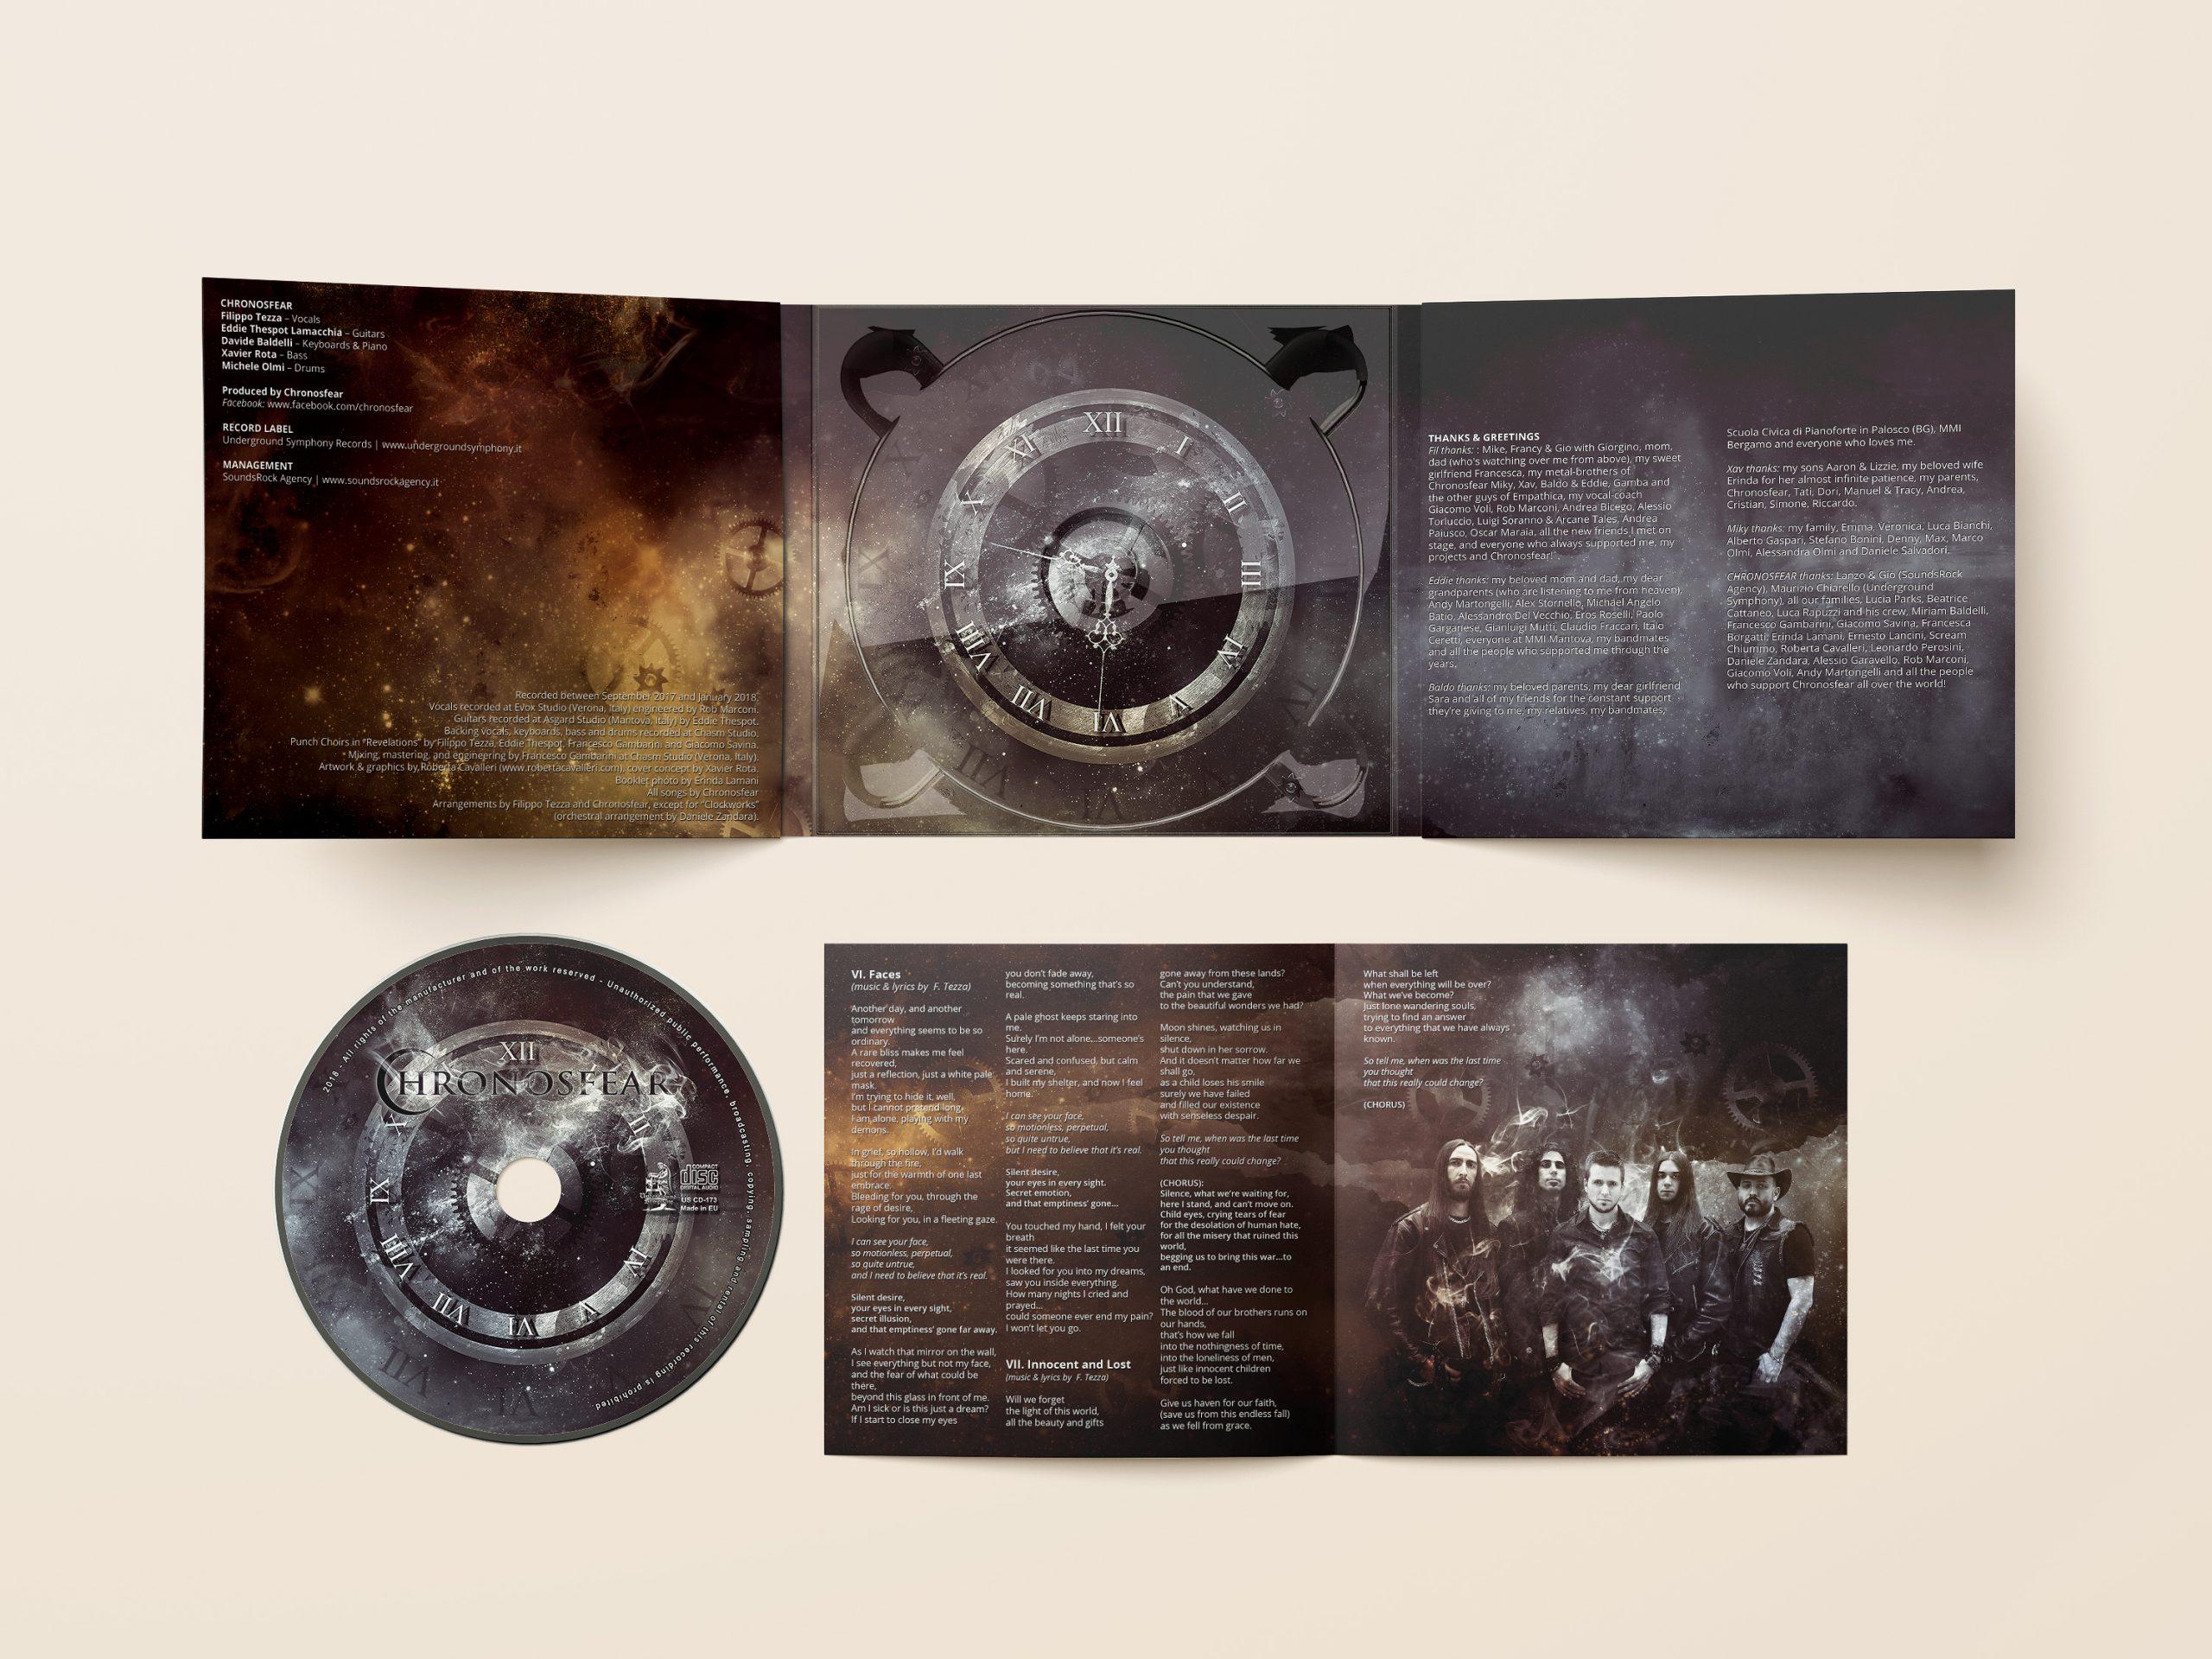 cd artwork and packaging